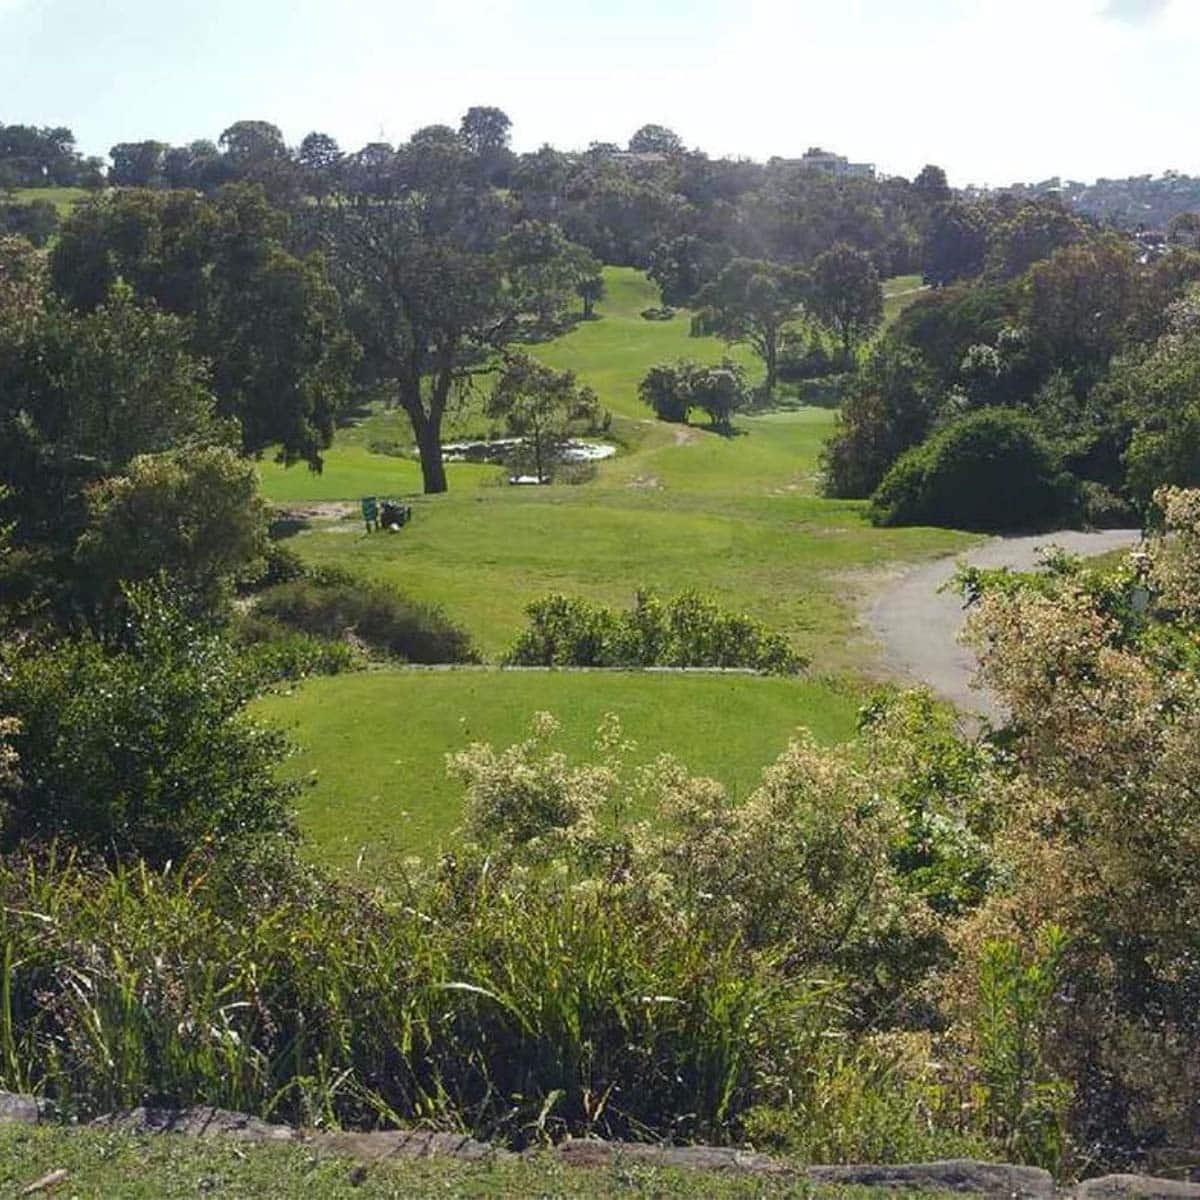 Scenery around the course at Northbridge Golf Club